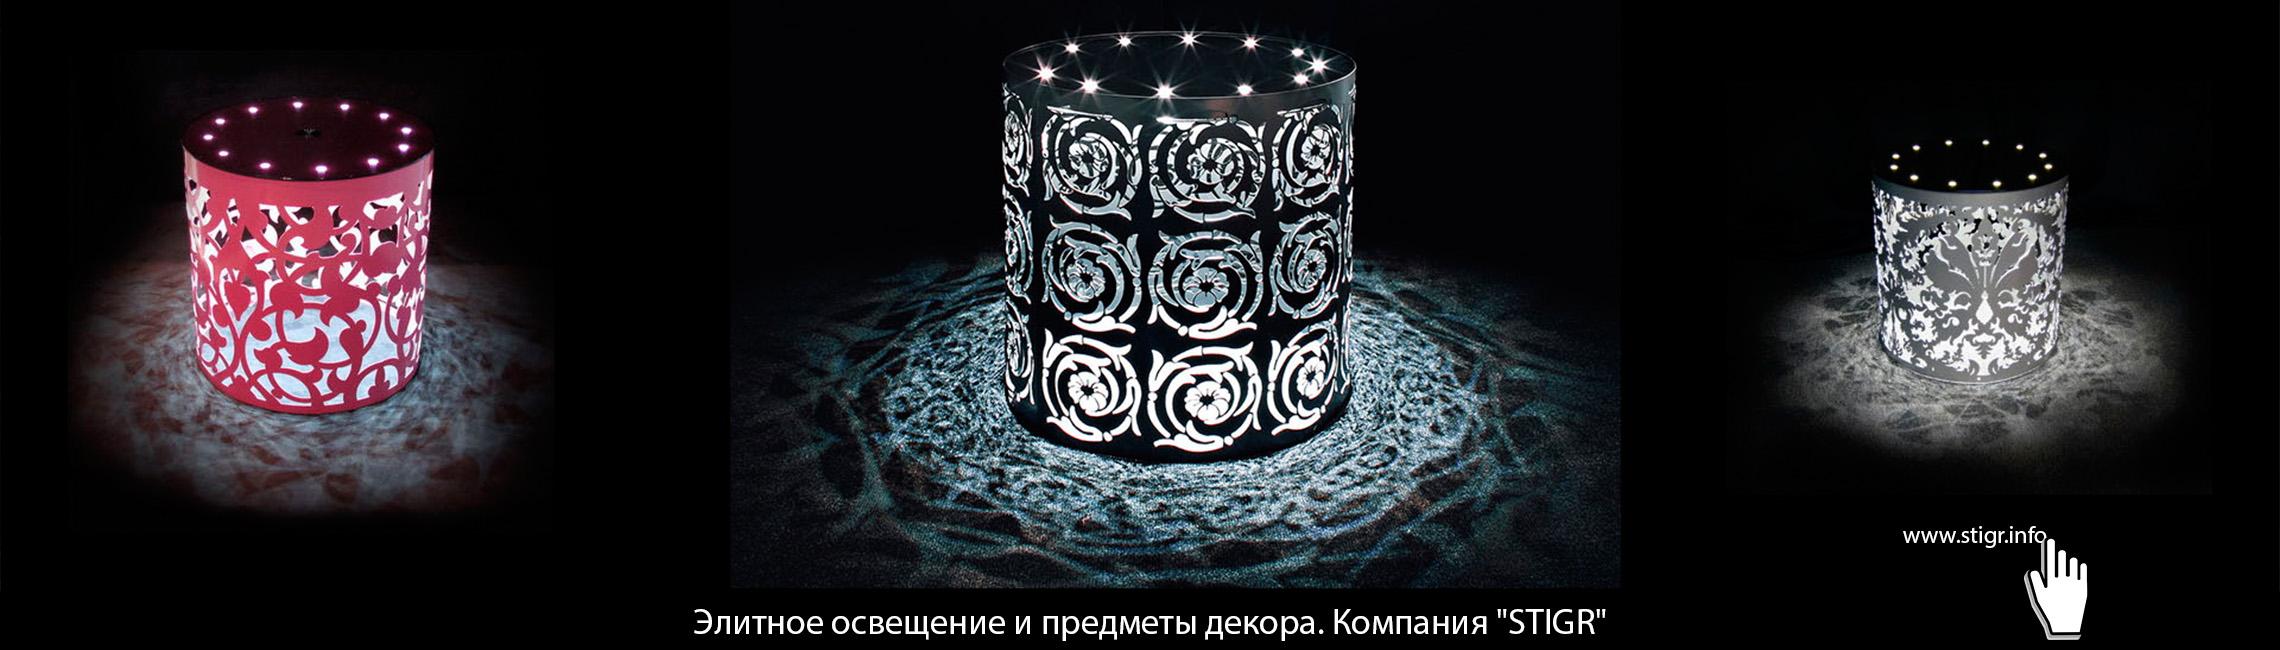 Snimok-e`kranar-2015-12-08-v-0.06.05 копия